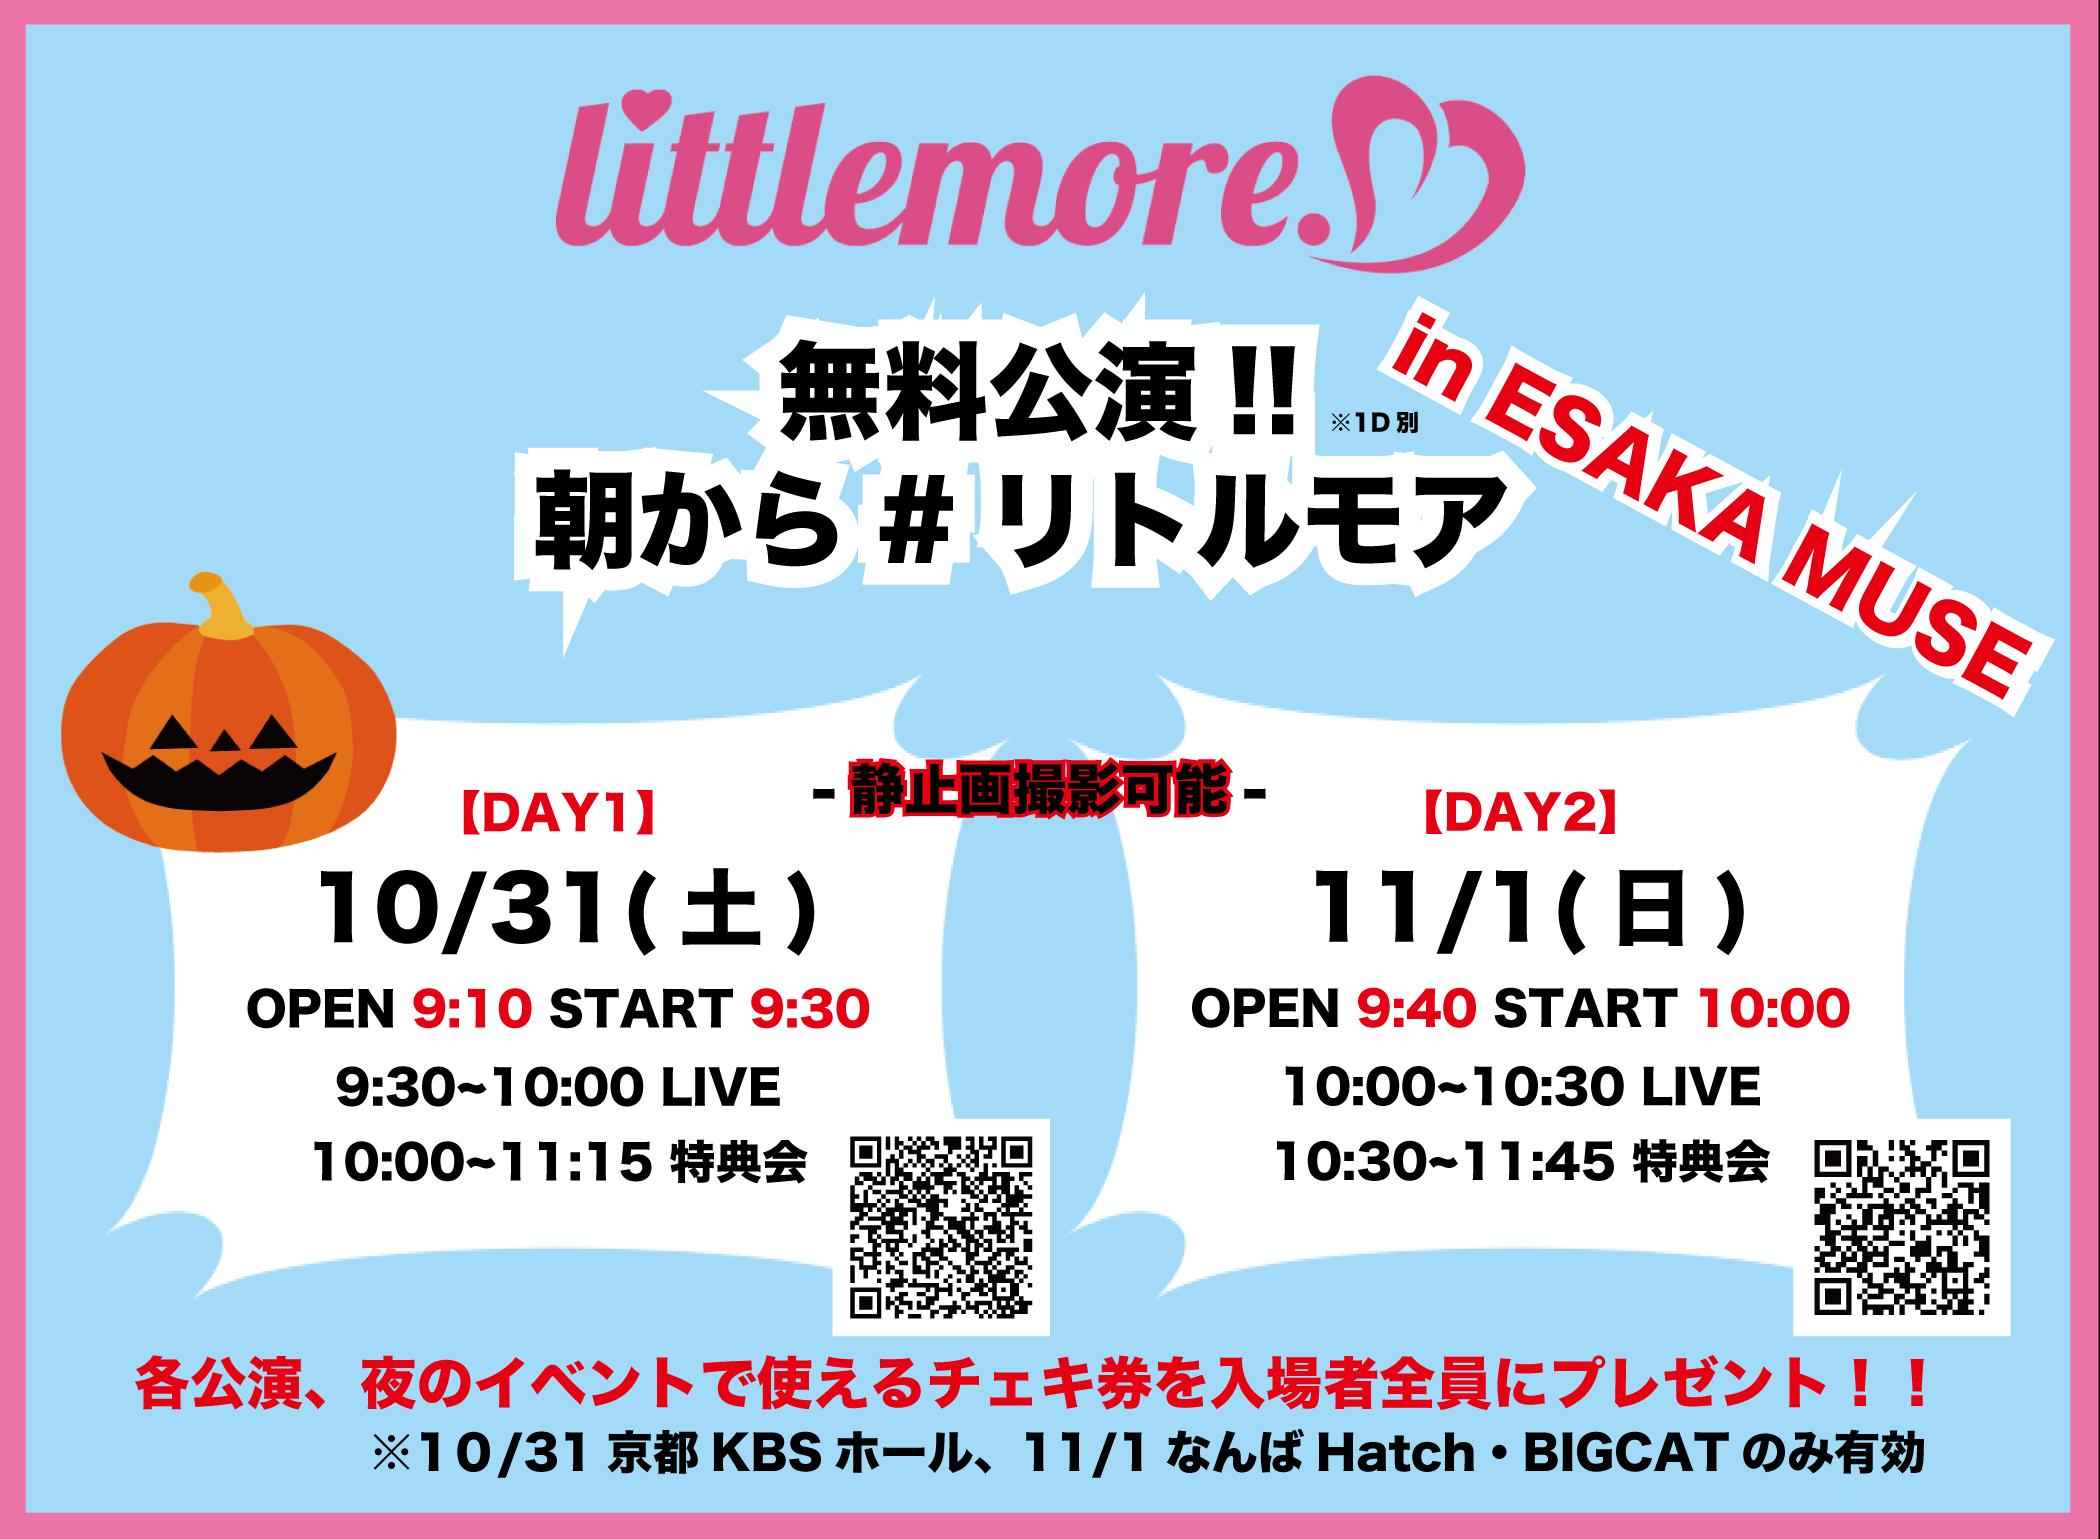 "littlemore. 無料公演 ~朝から #リトルモア 大阪編 ""day1""~"